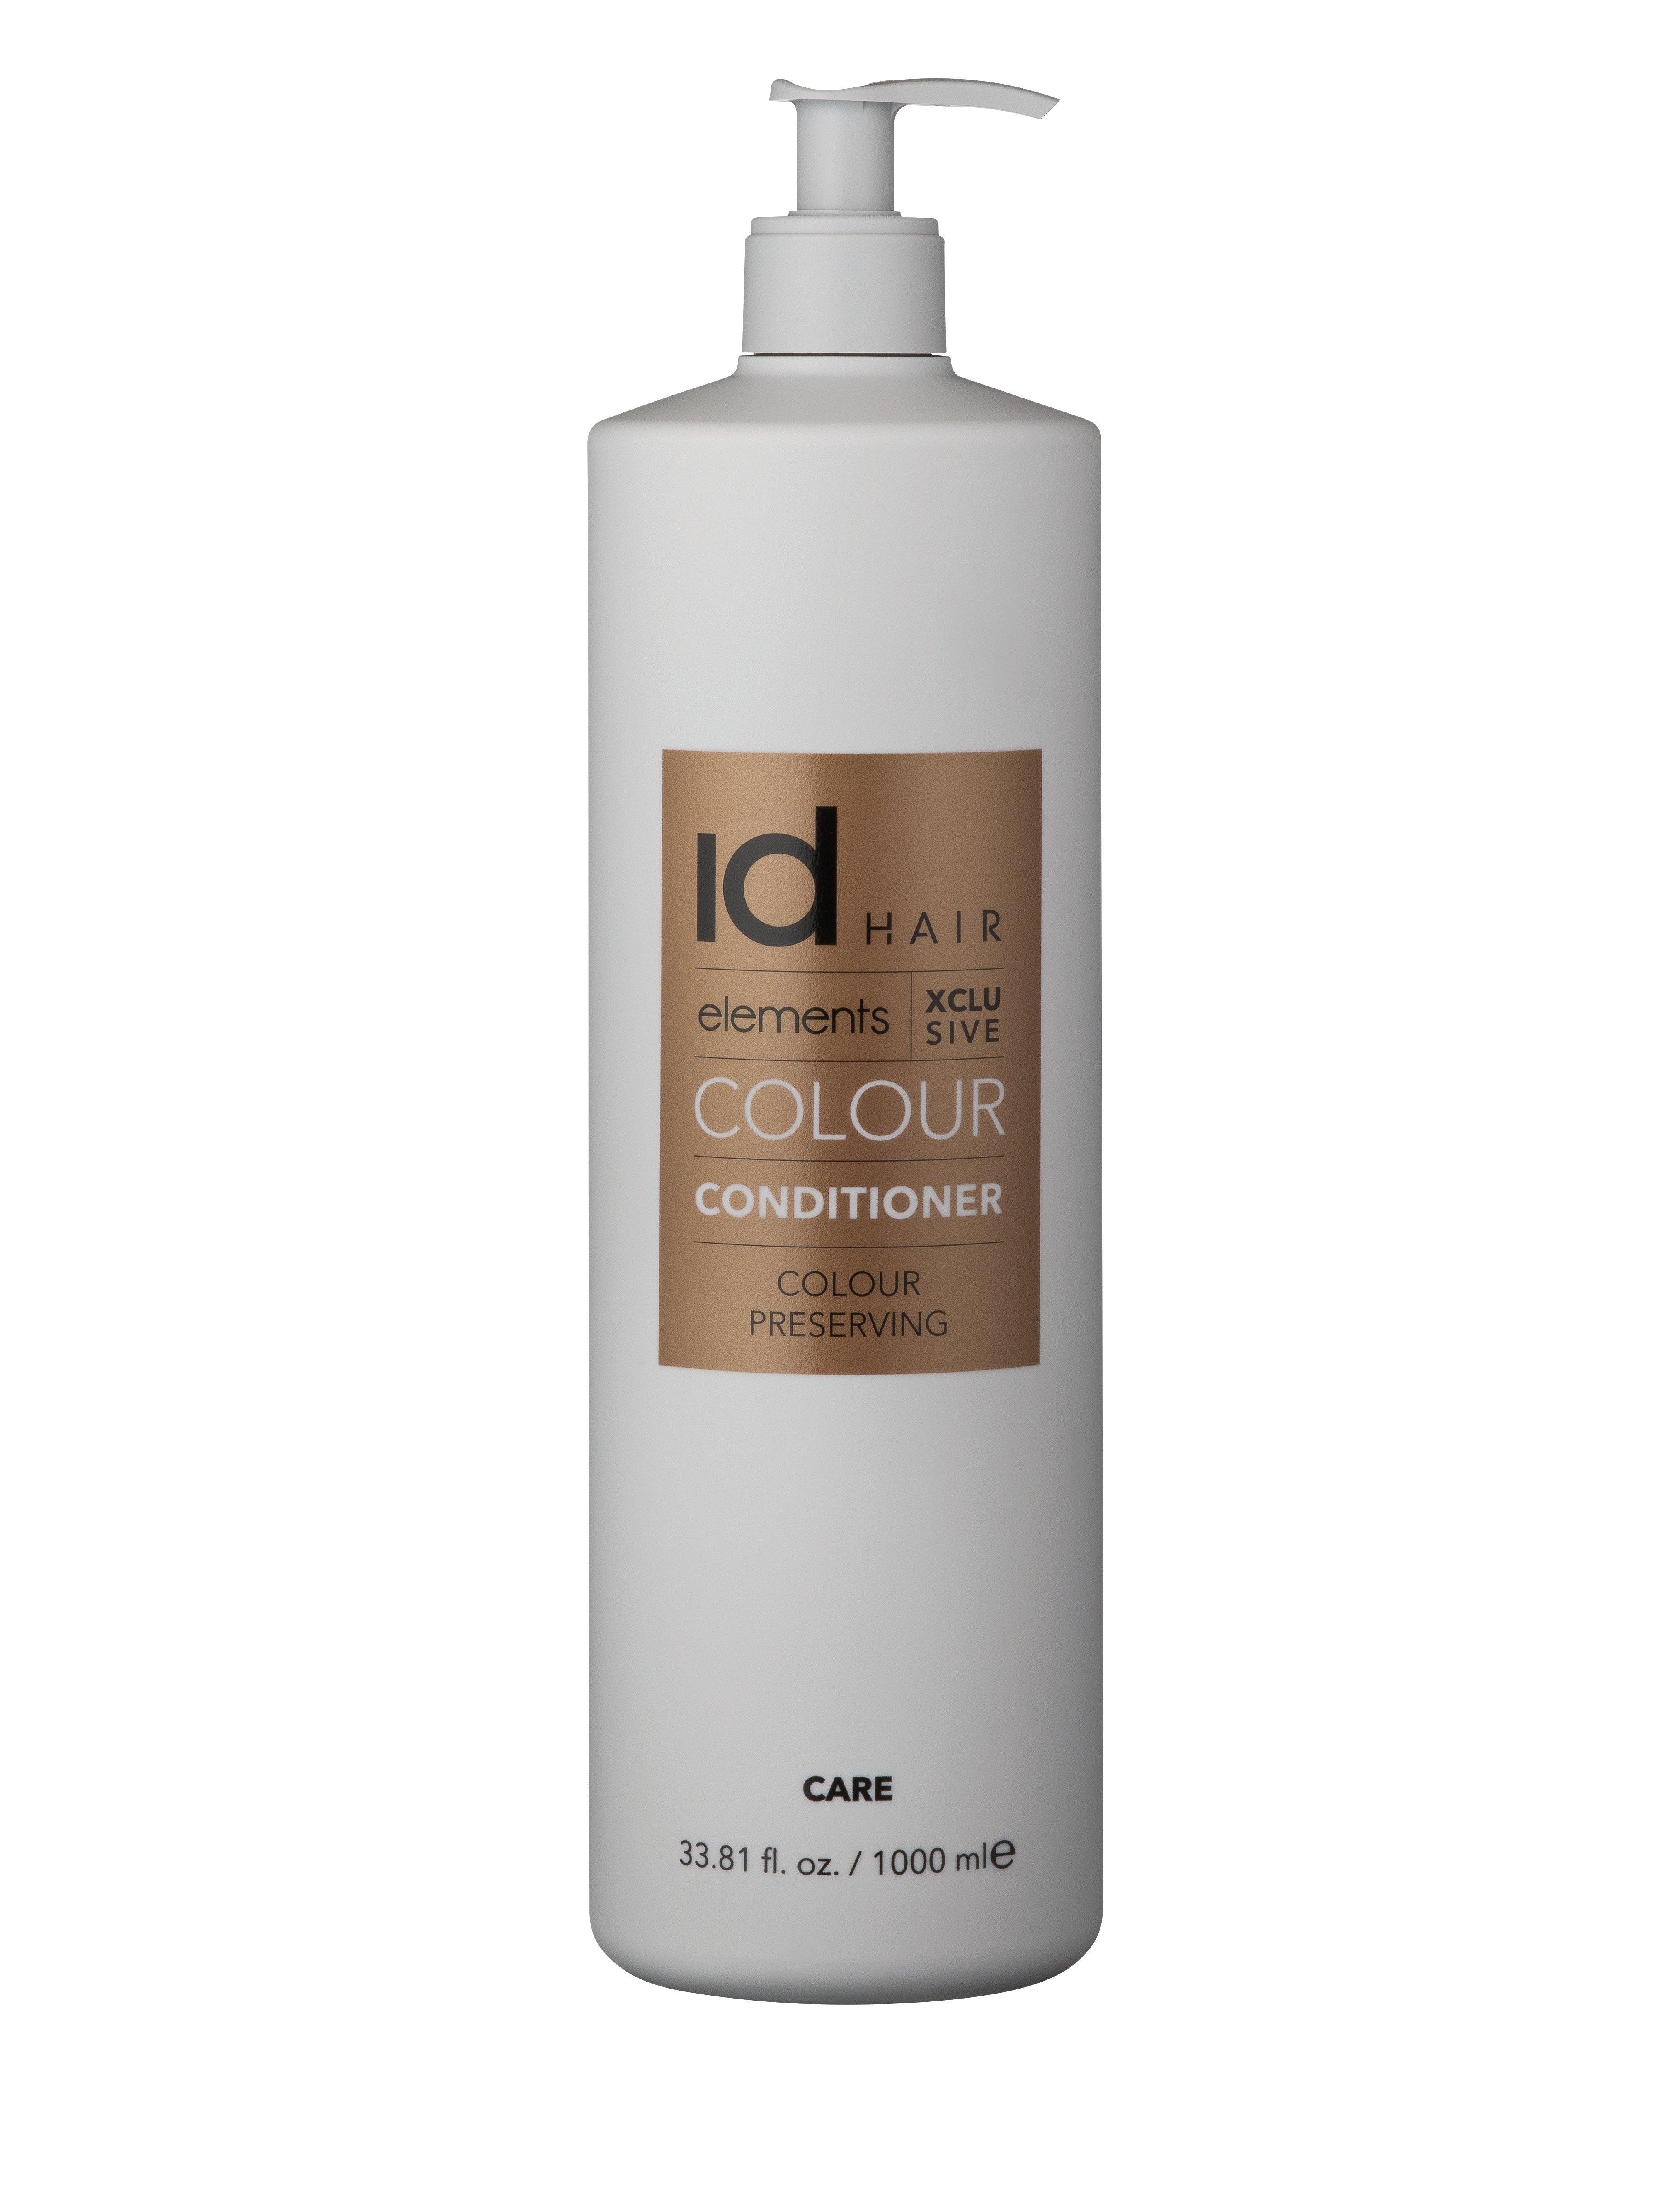 IdHAIR - Elements Xclusive Colour Conditioner 1000 ml